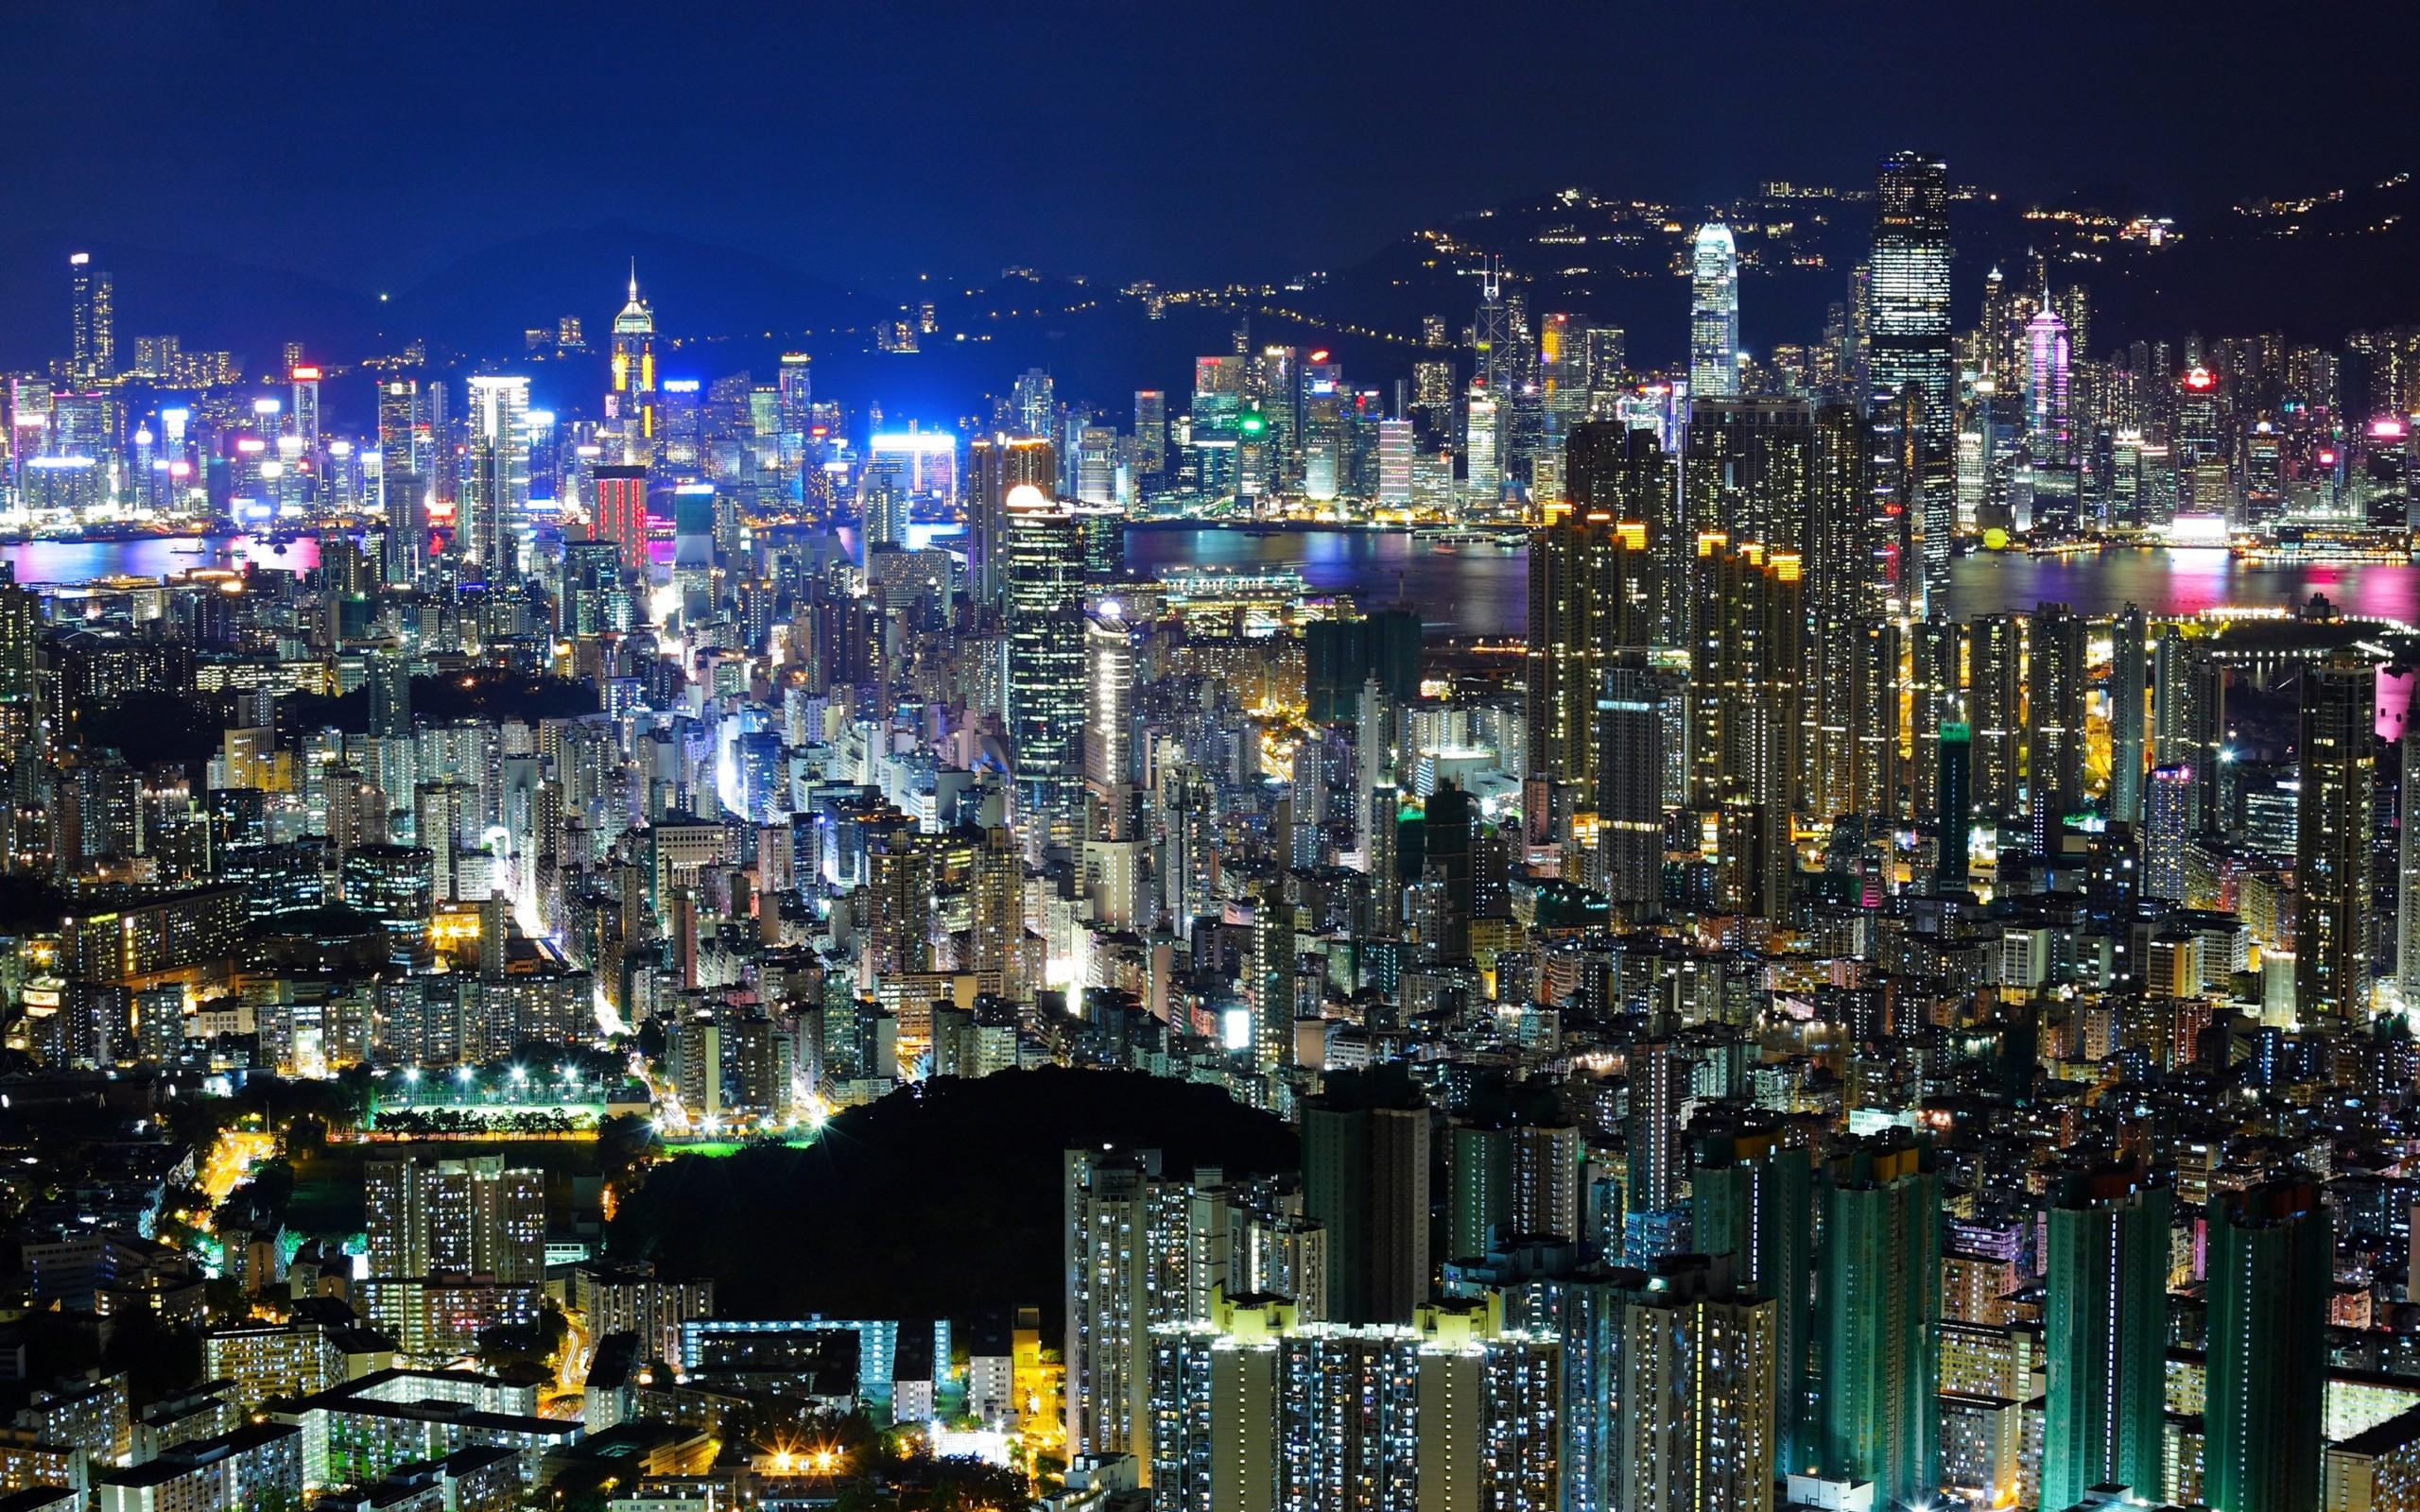 Hong Kong HD Wallpaper | Background Image | 2560x1600 | ID ...